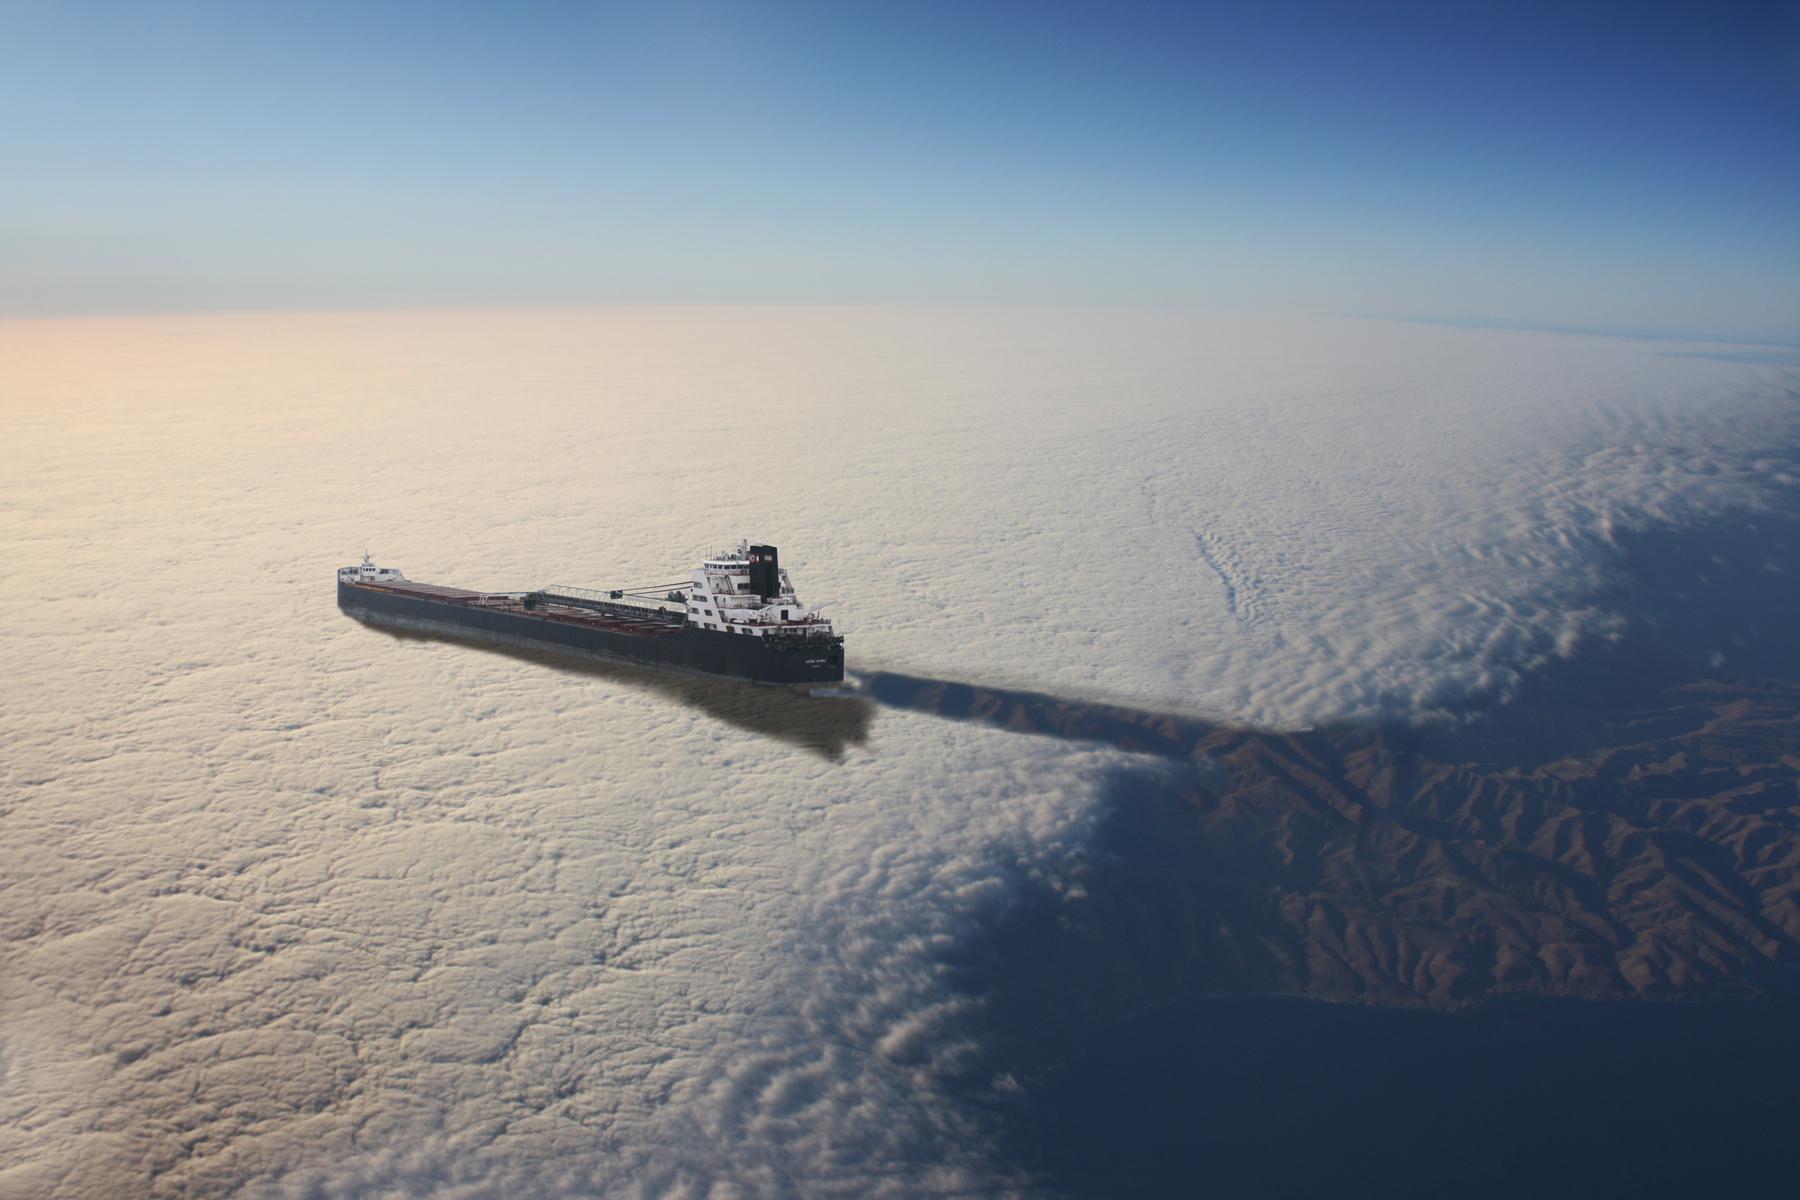 Sky shipping